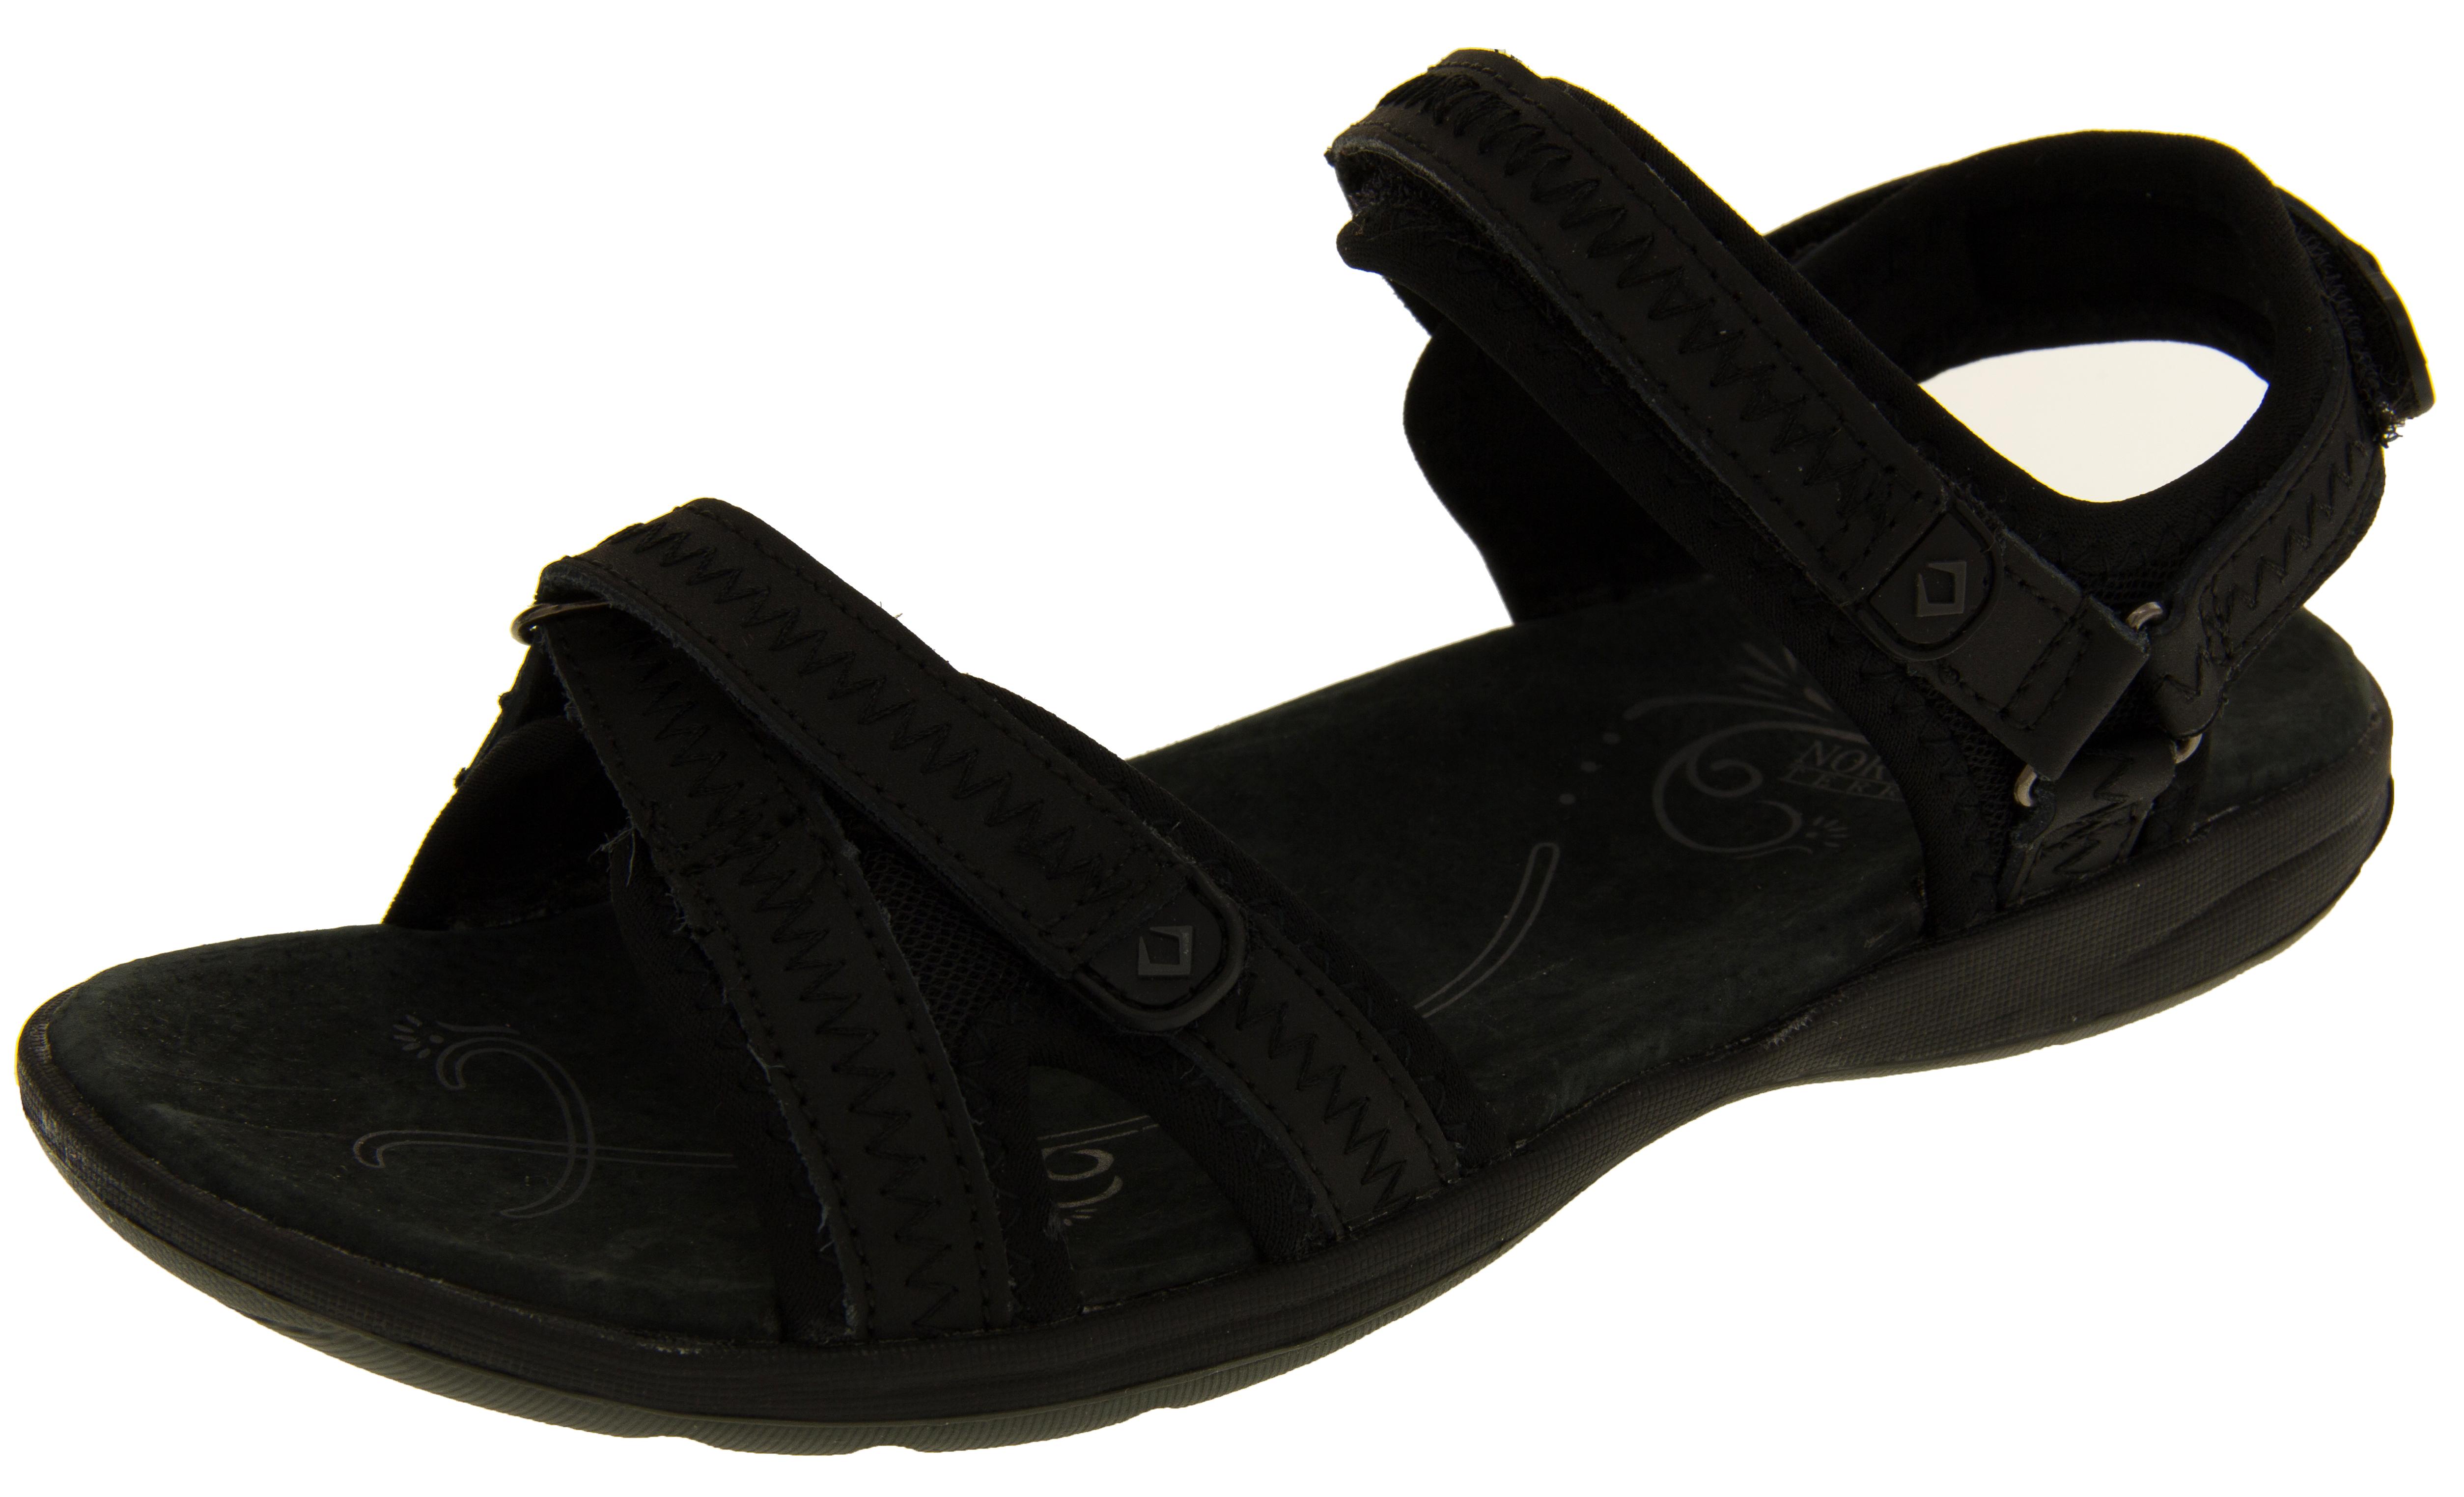 Innovative Ecco Womens Velcro Strap Sandals Sand | McElhinneys